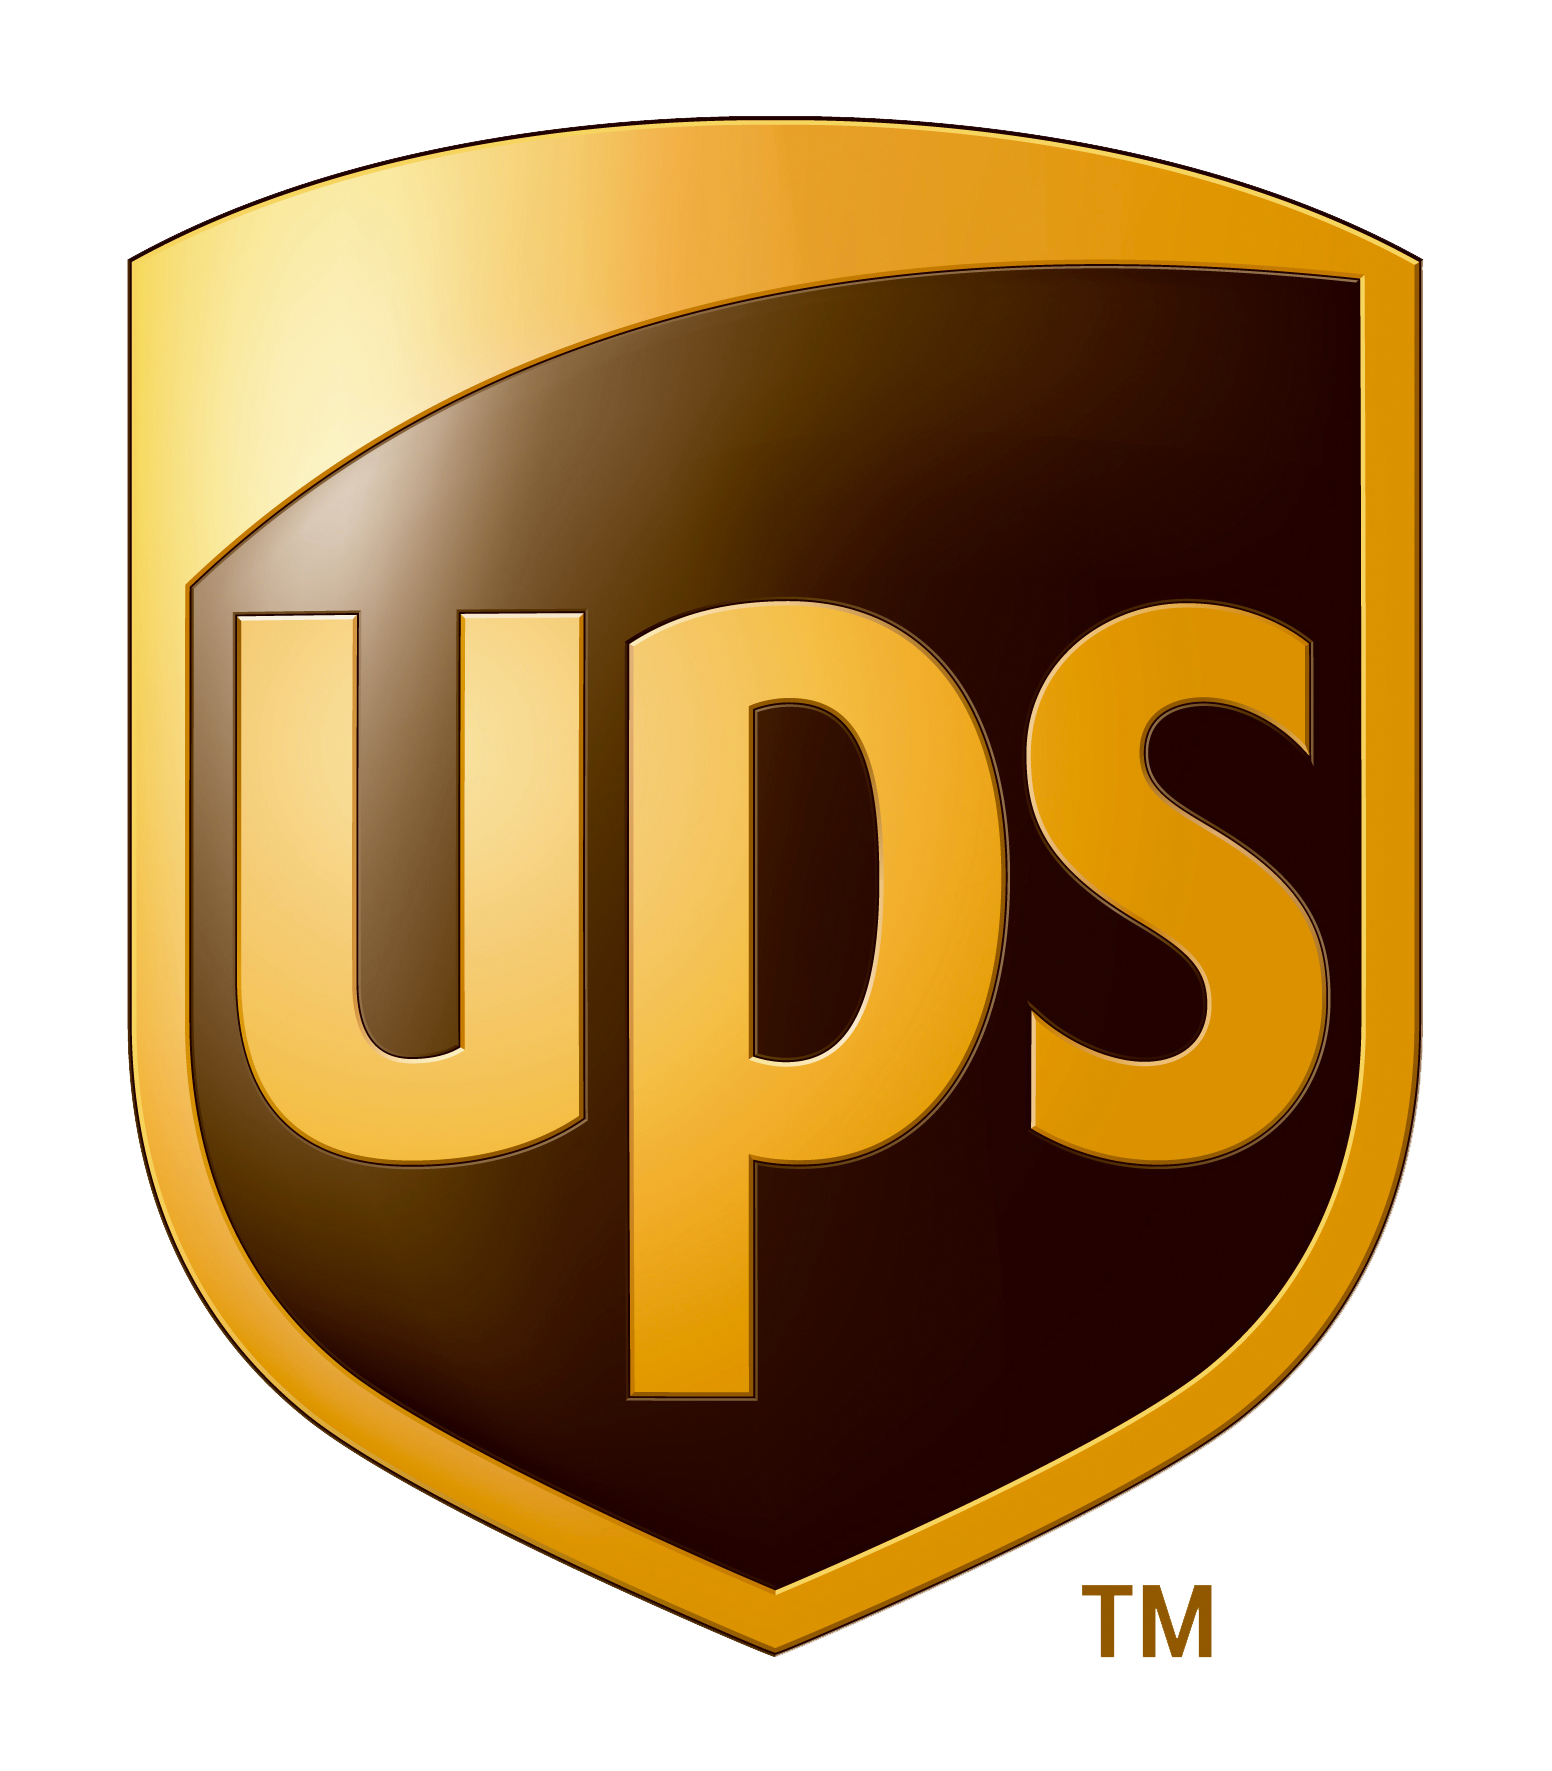 ups-logo.gif